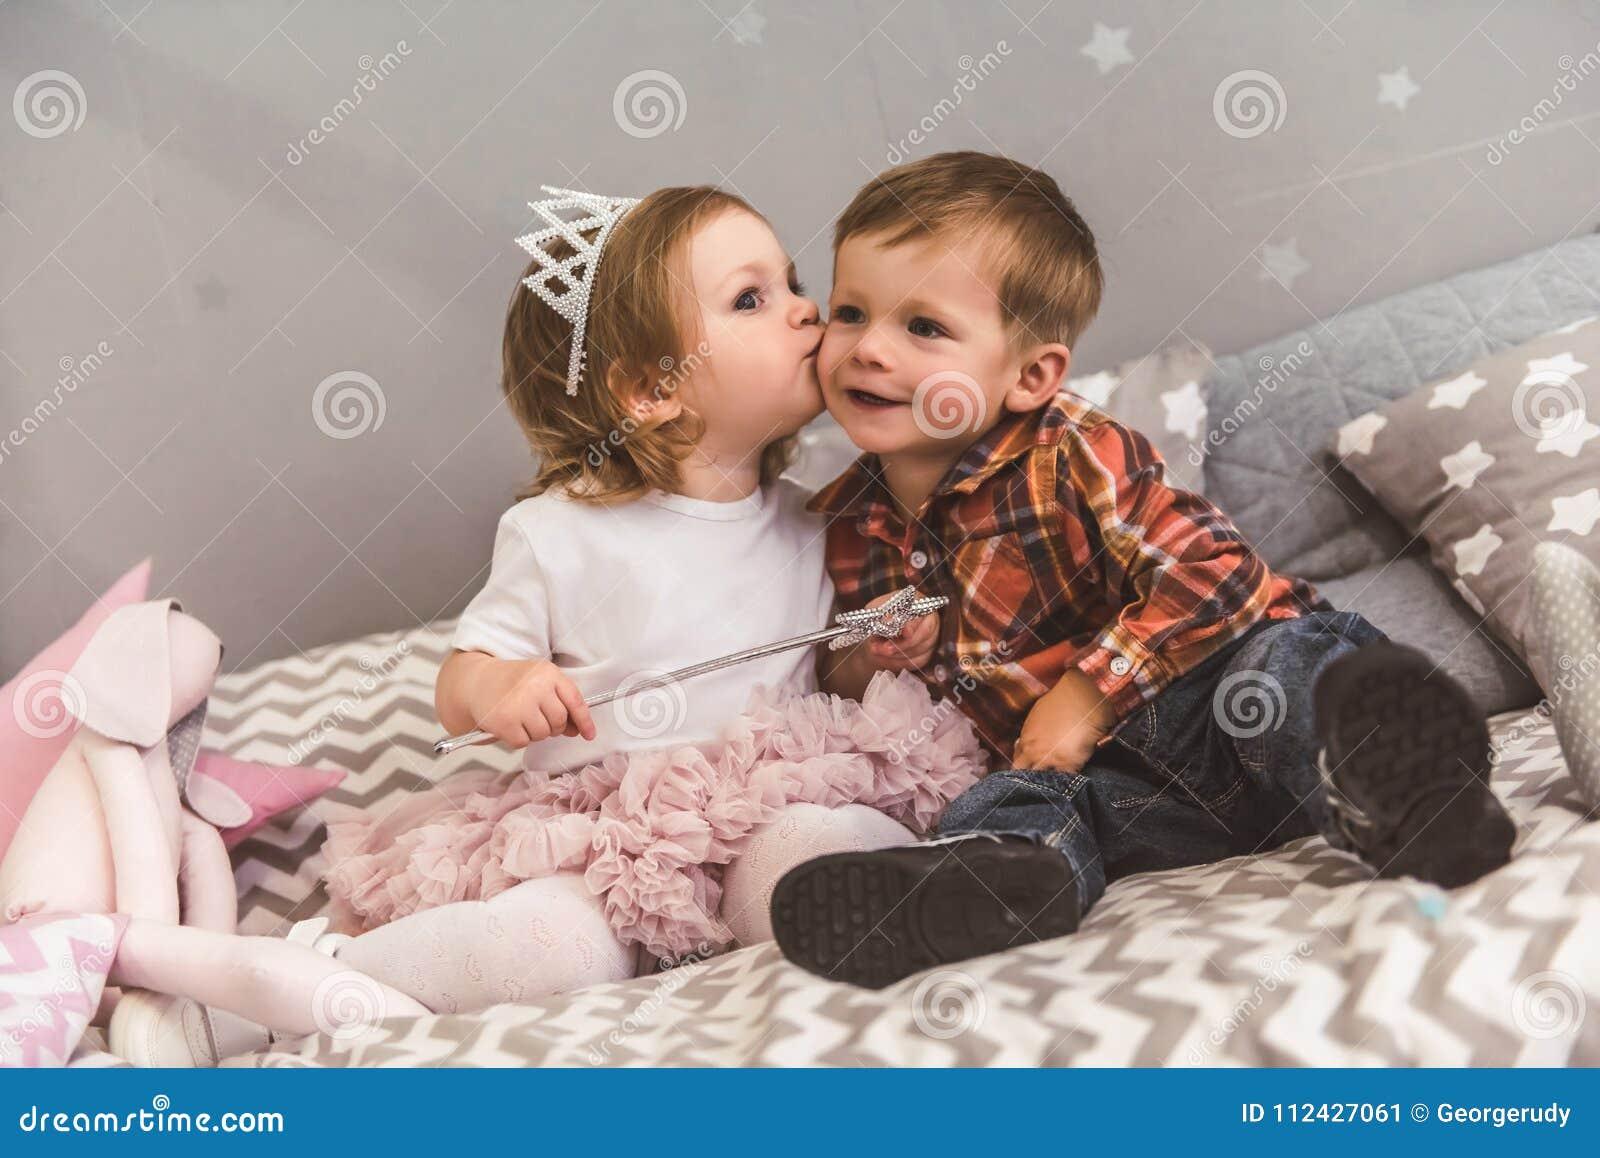 Cute Couple Of Kids Stock Image Image Of Child Cheek 112427061